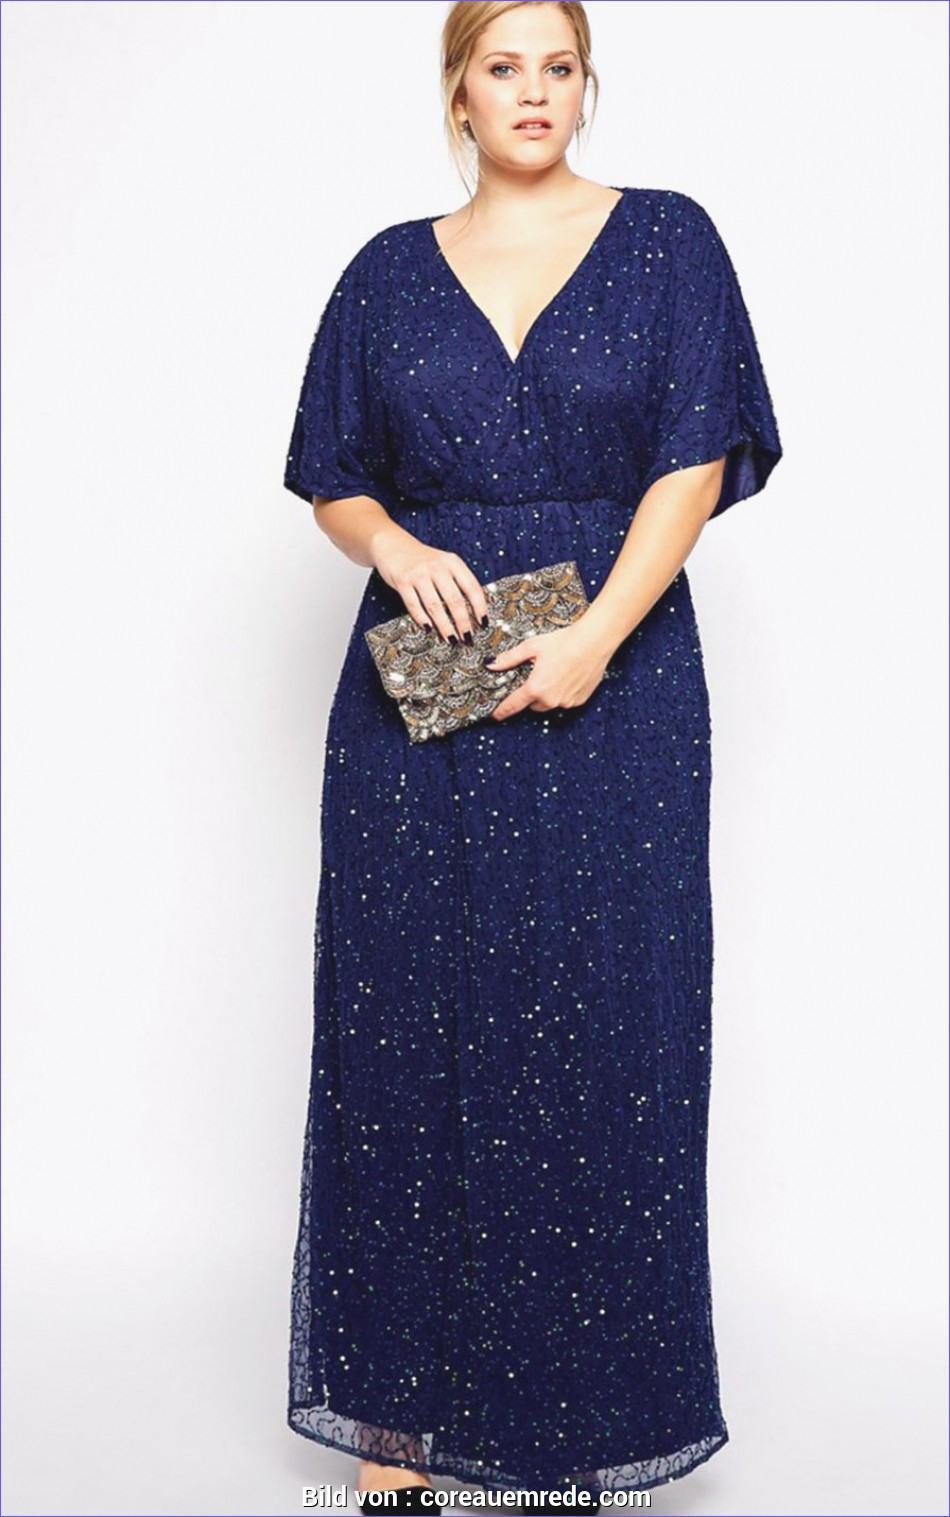 13 Kreativ Damen Abendbekleidung DesignAbend Erstaunlich Damen Abendbekleidung Design